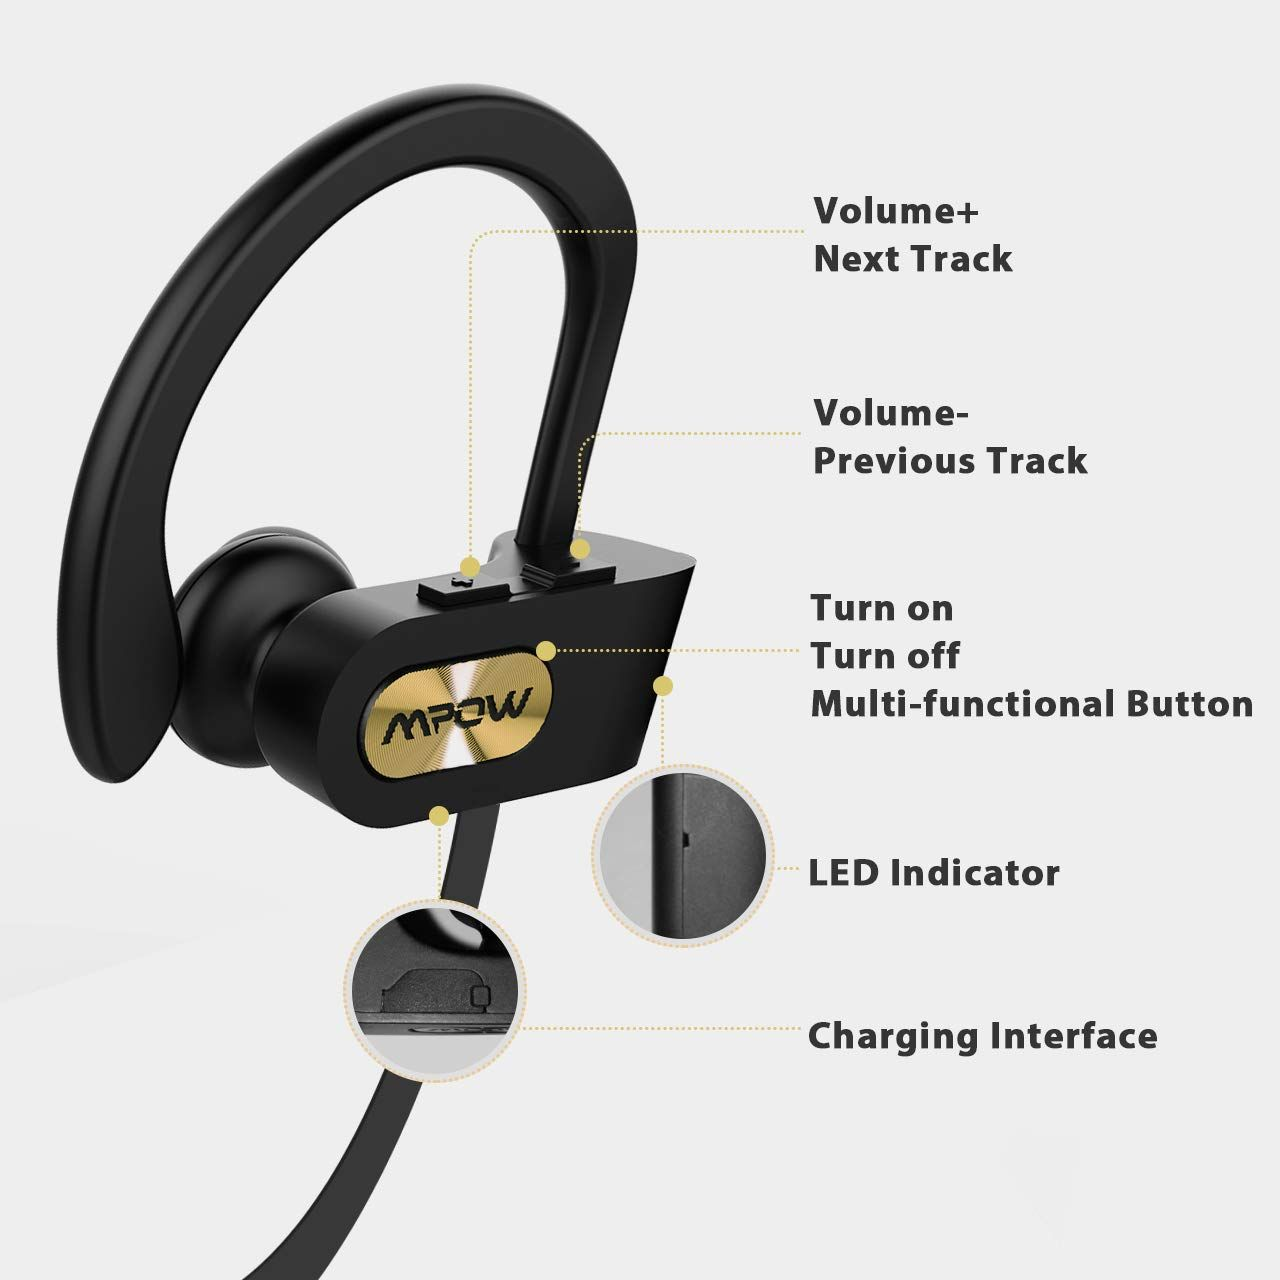 39e98d5f7a8 Mpow Flame Bluetooth Headphones Waterproof IPX7, Wireless Earbuds Sport,  Richer Bass HiFi Stereo in-Ear Earphones w/Mic,Case, 7-9 Hrs Playback  Cancelling ...